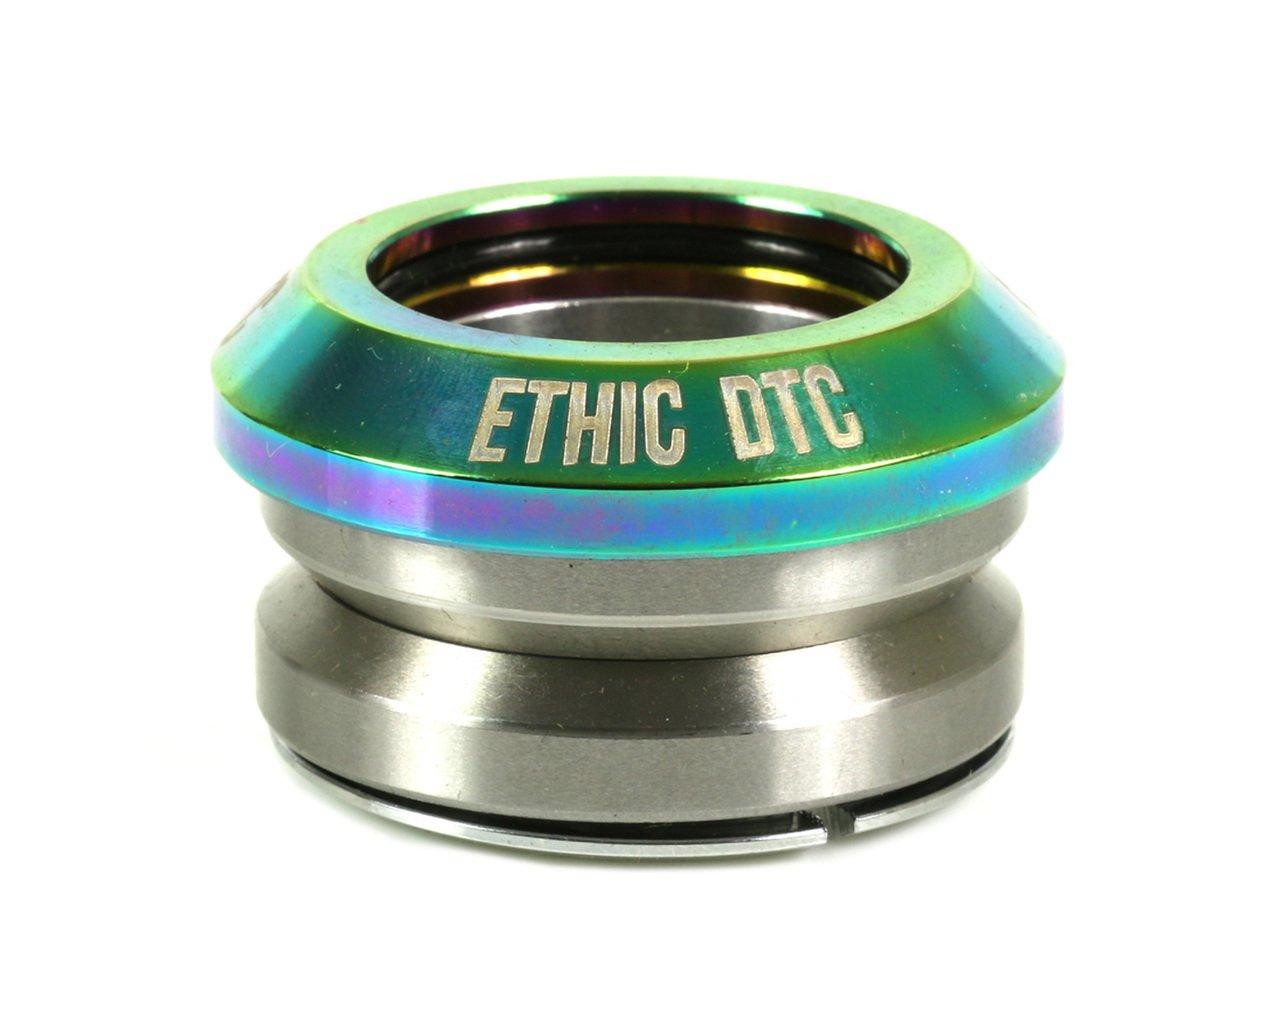 Ethic Integrated Headset Neochrome / Oil Slick